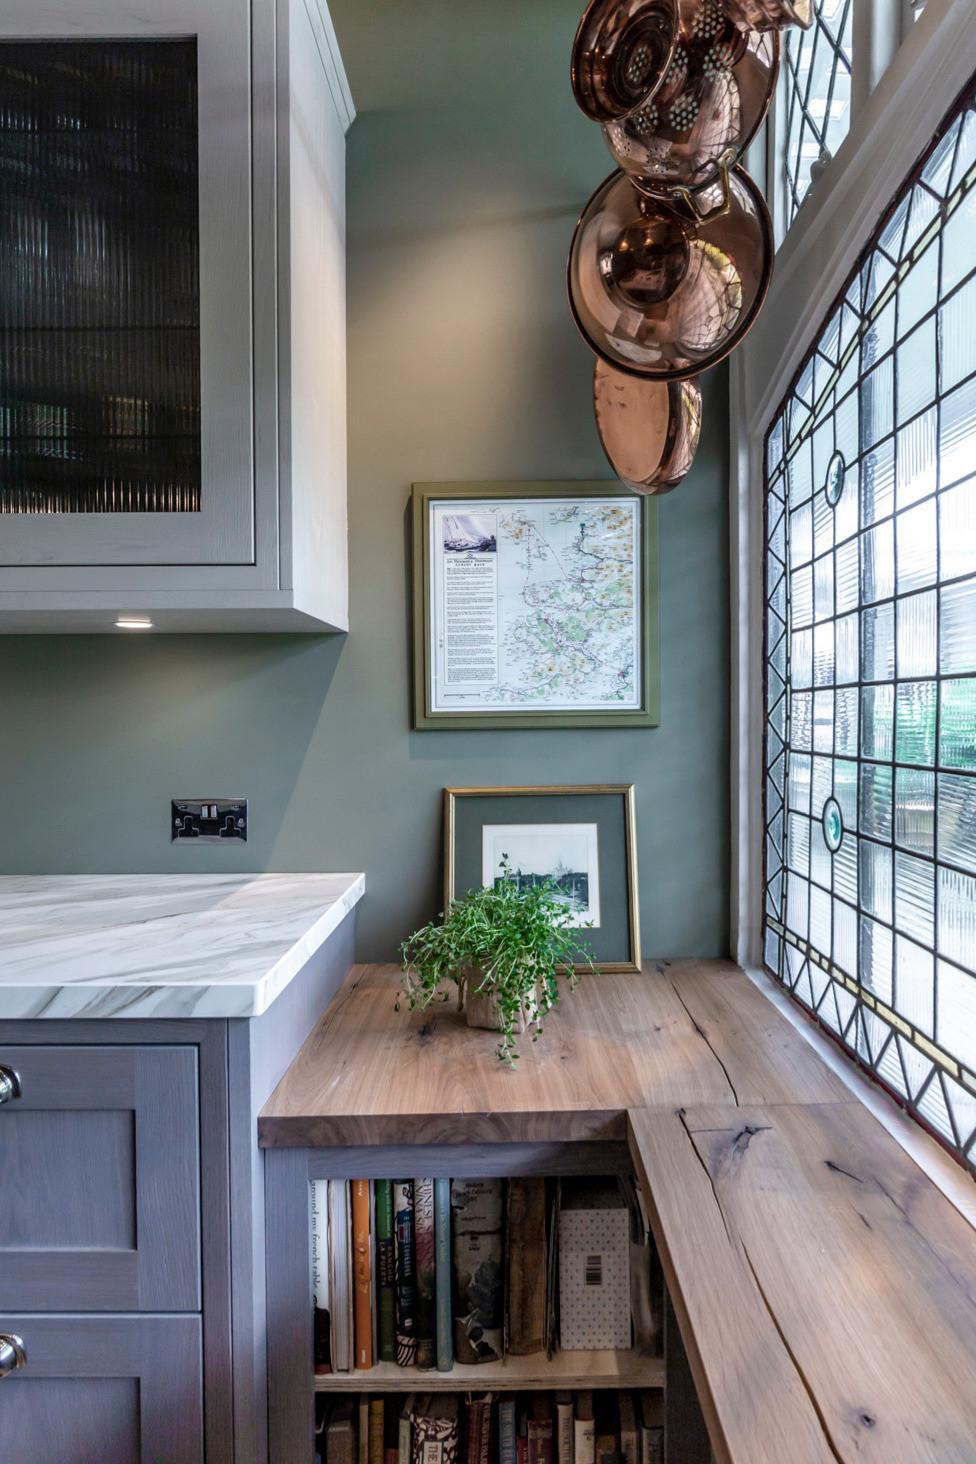 Rustic oak shelf under window in kitchen refurb with shelves for cookbooks